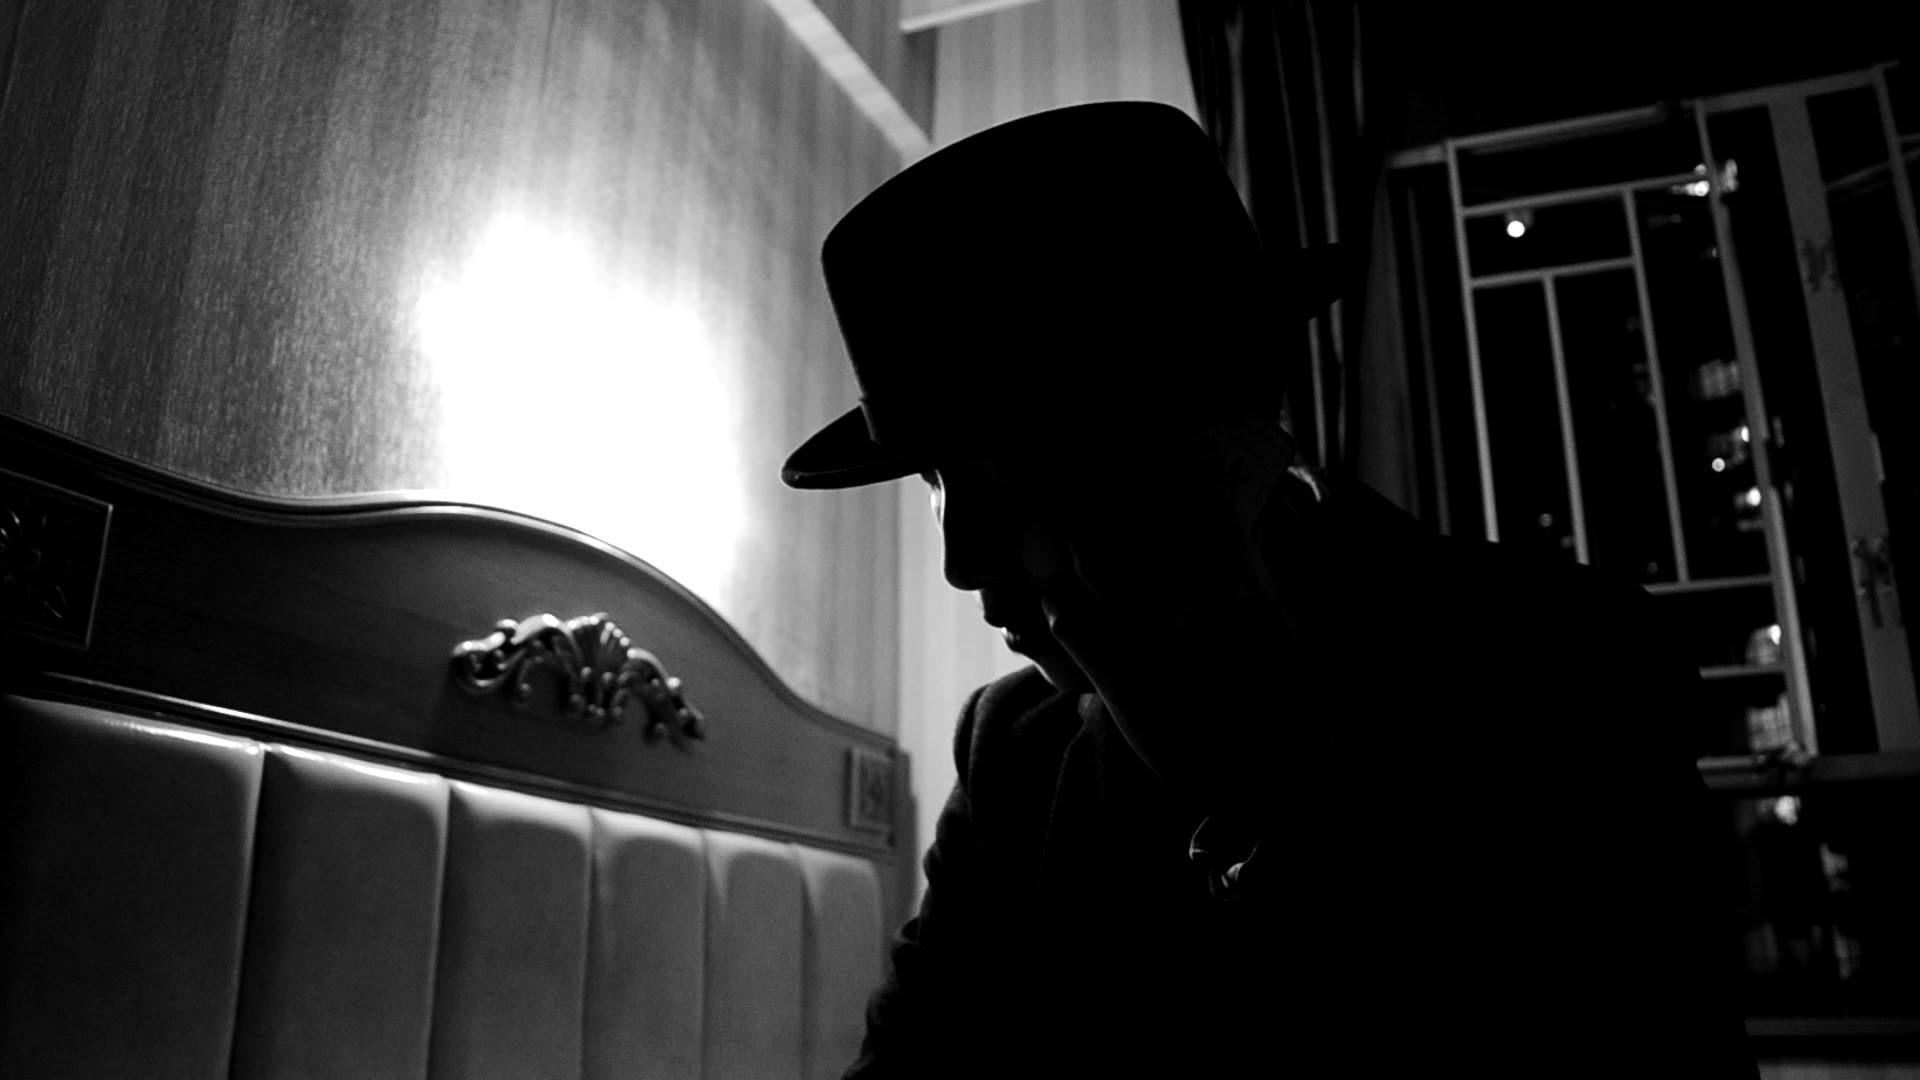 Dark Noir Wallpaper: Film Noir Wallpaper ·① WallpaperTag